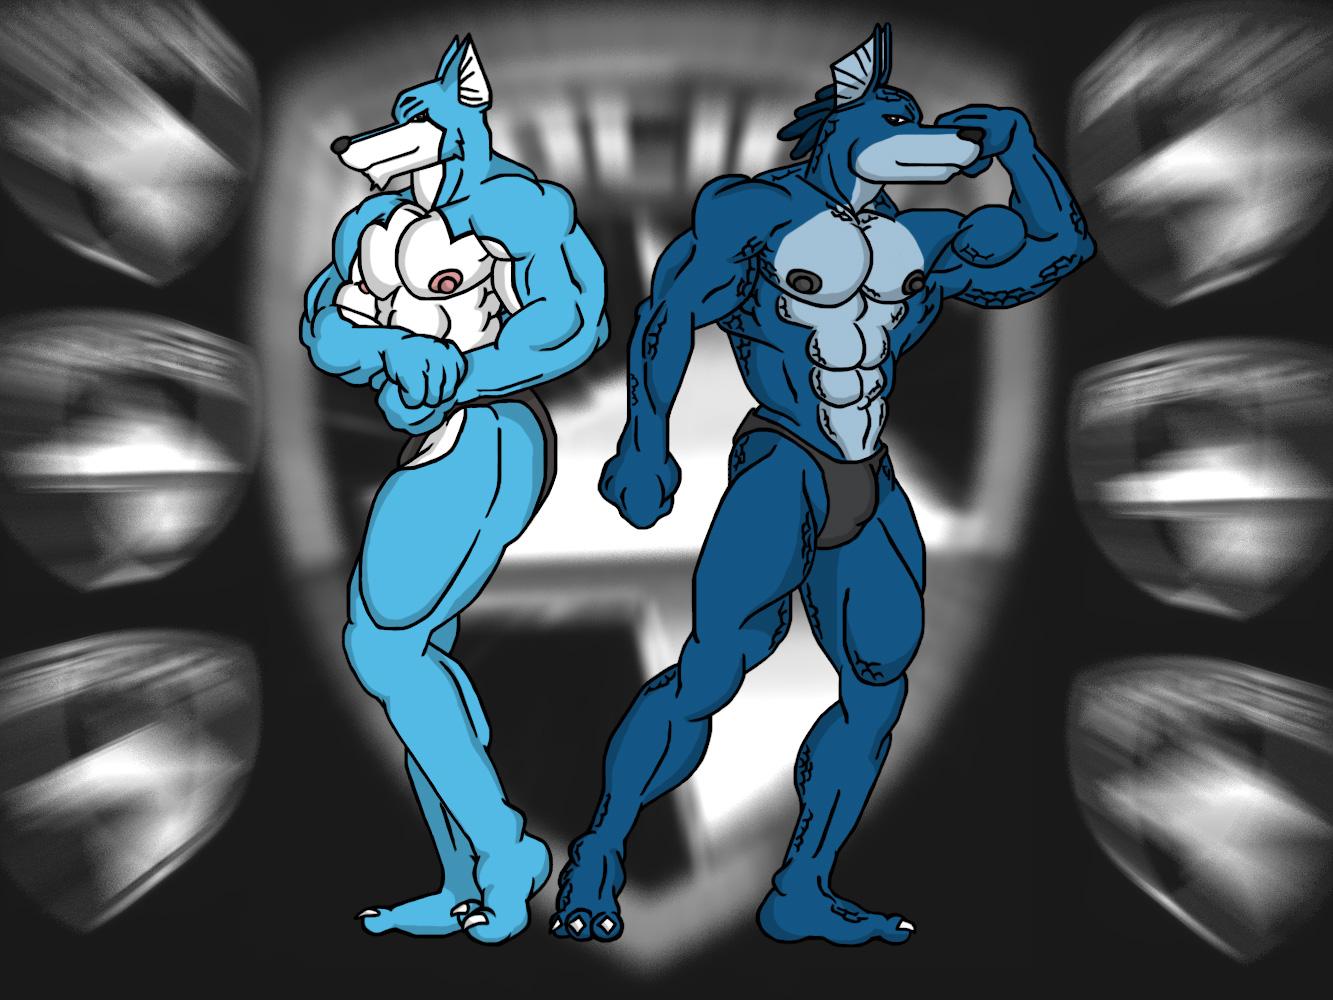 Power rangers doggie kruger porn - Doggies posedown on deviantart jpg  1333x1000